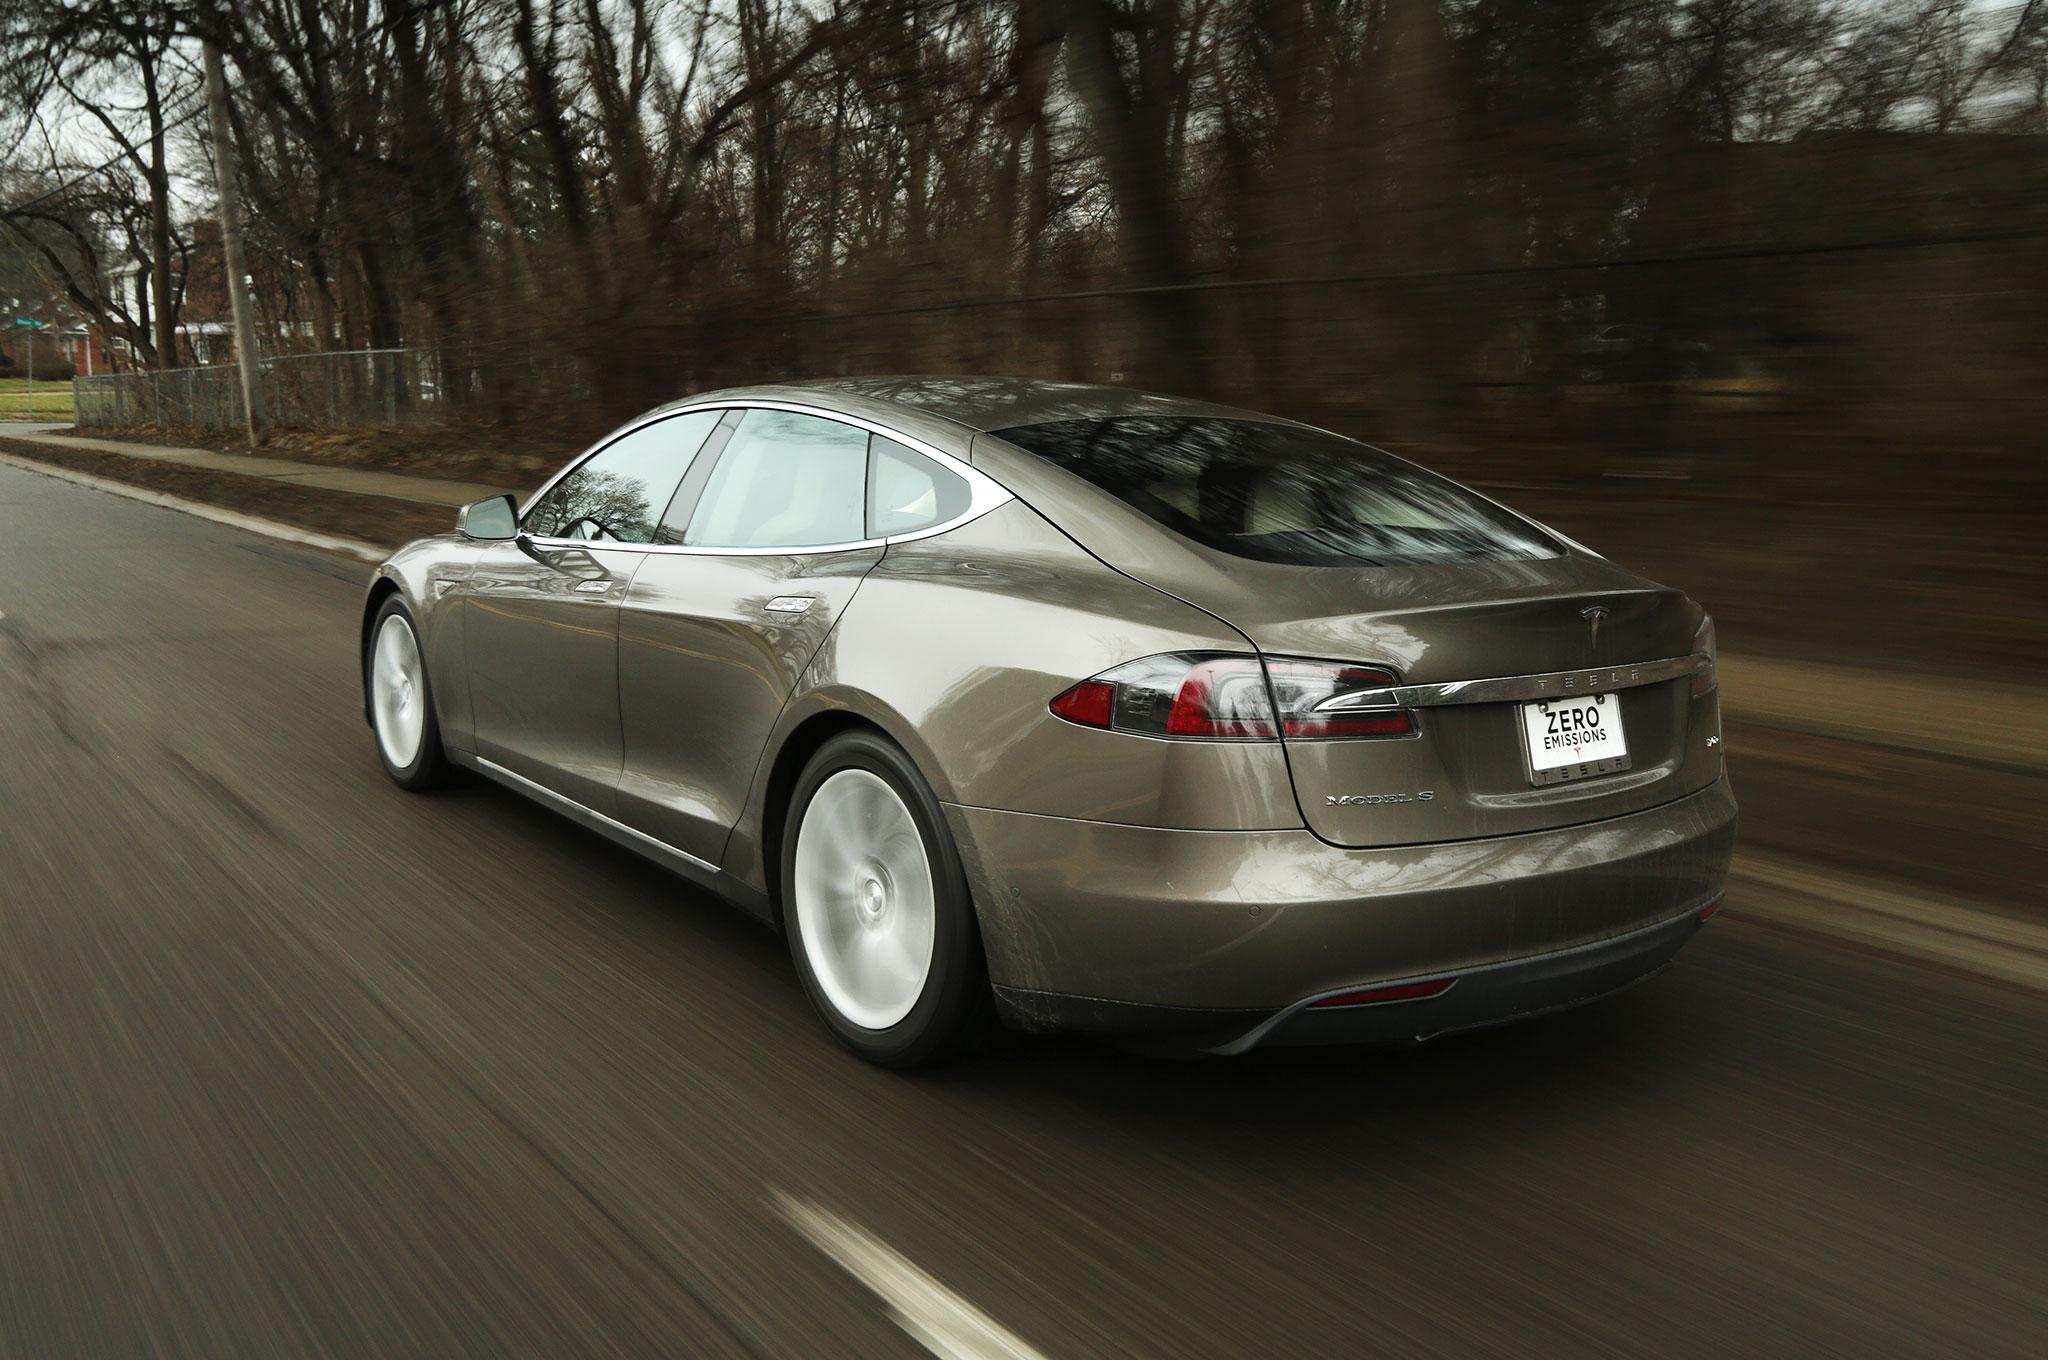 2015 Tesla Model S 70d Around The Block